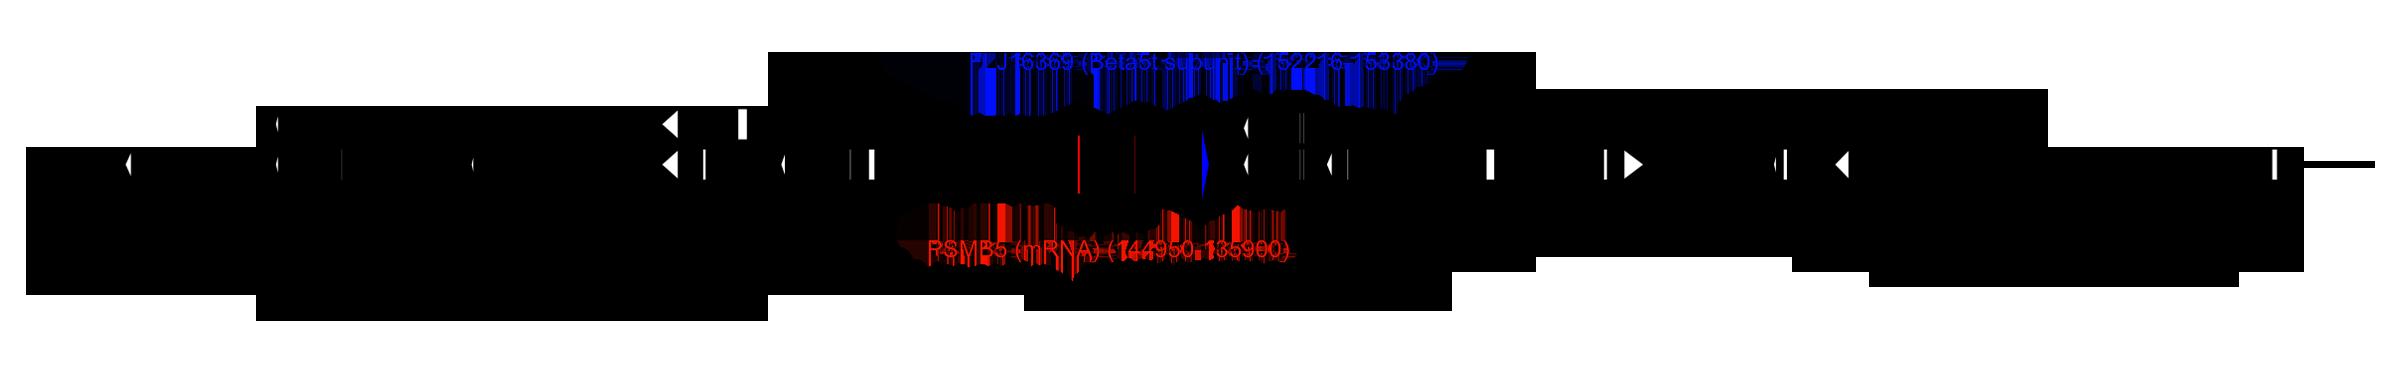 Human chromosome 14